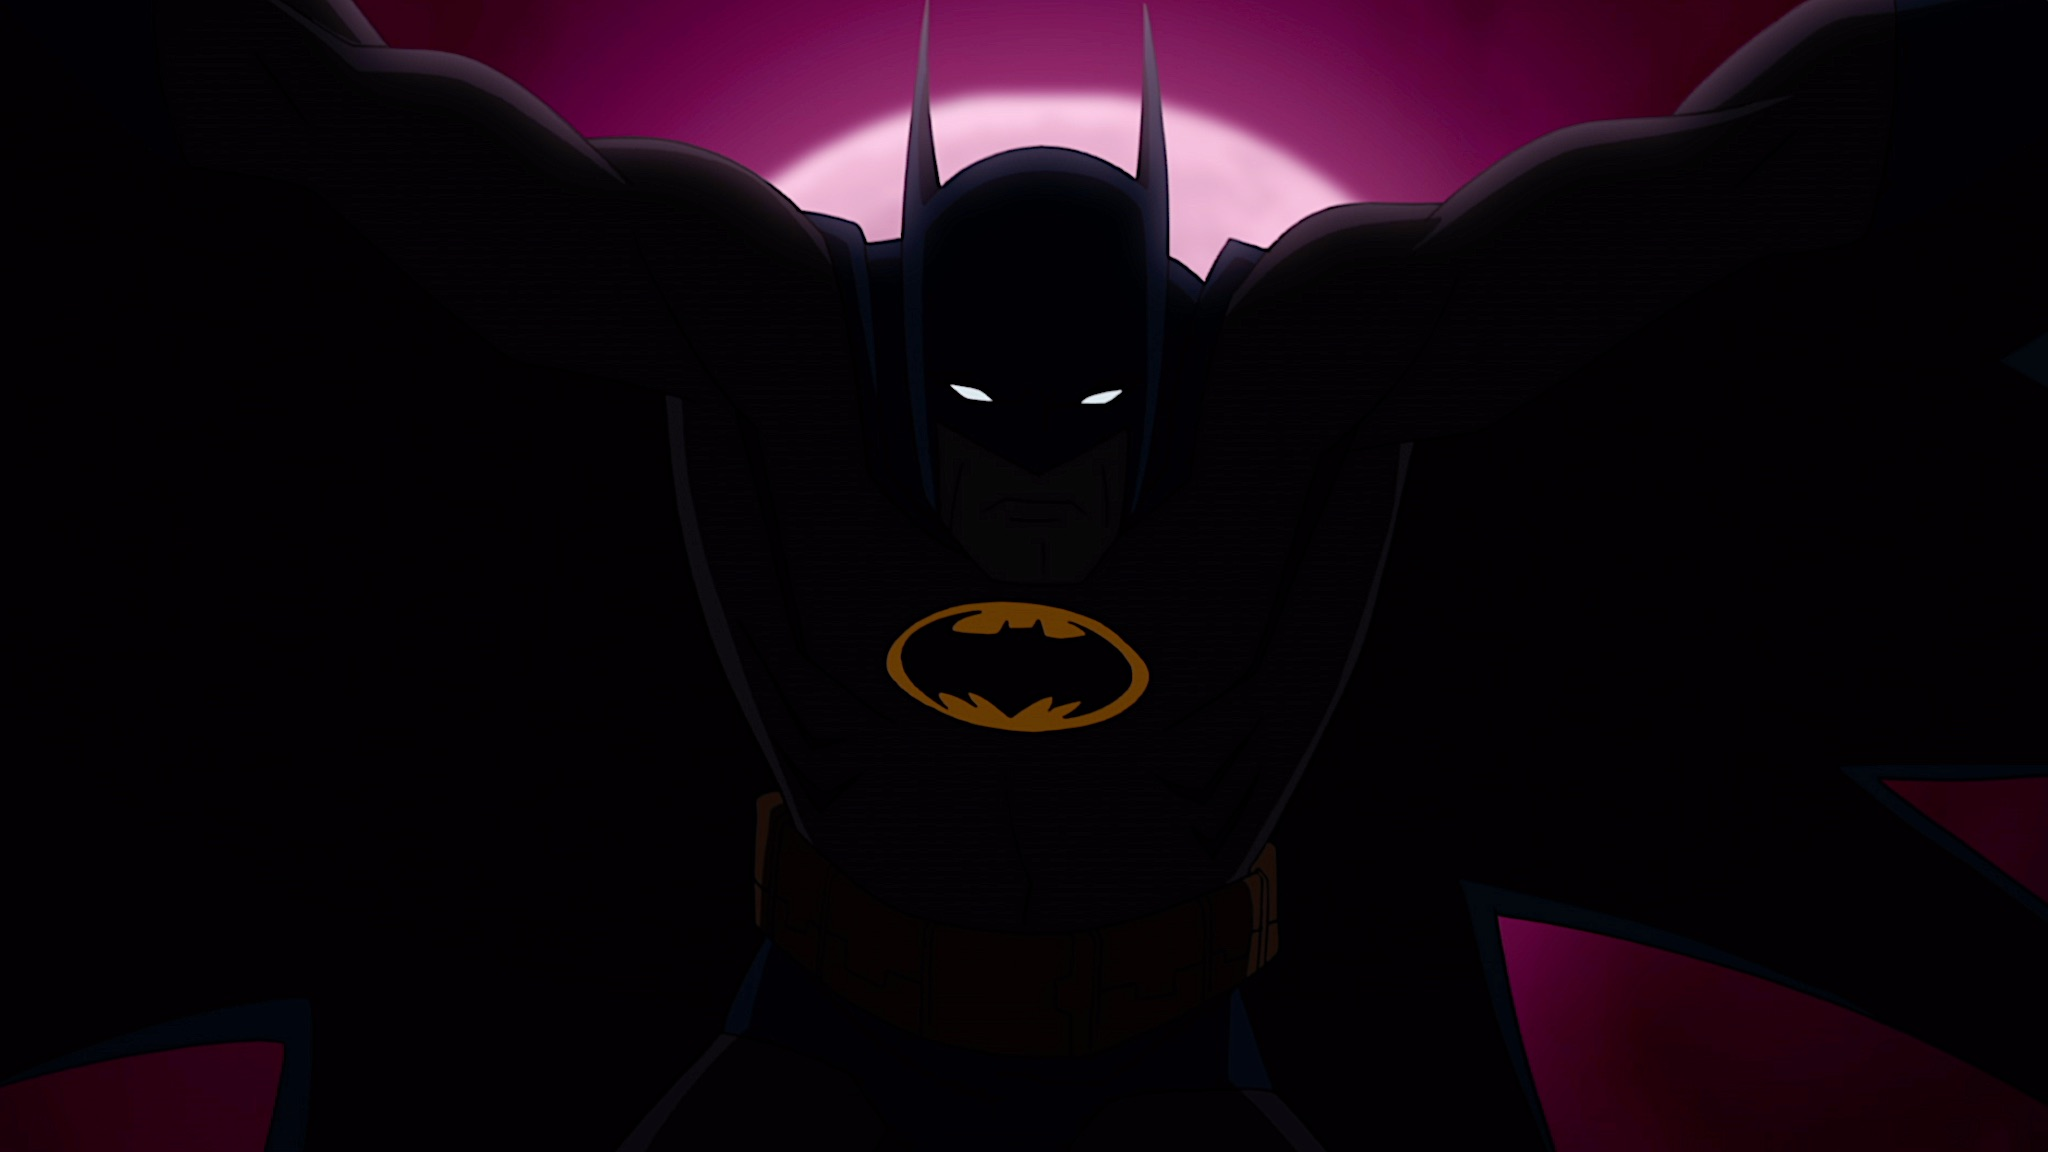 Batman-TMNT Bat silhouette.jpeg